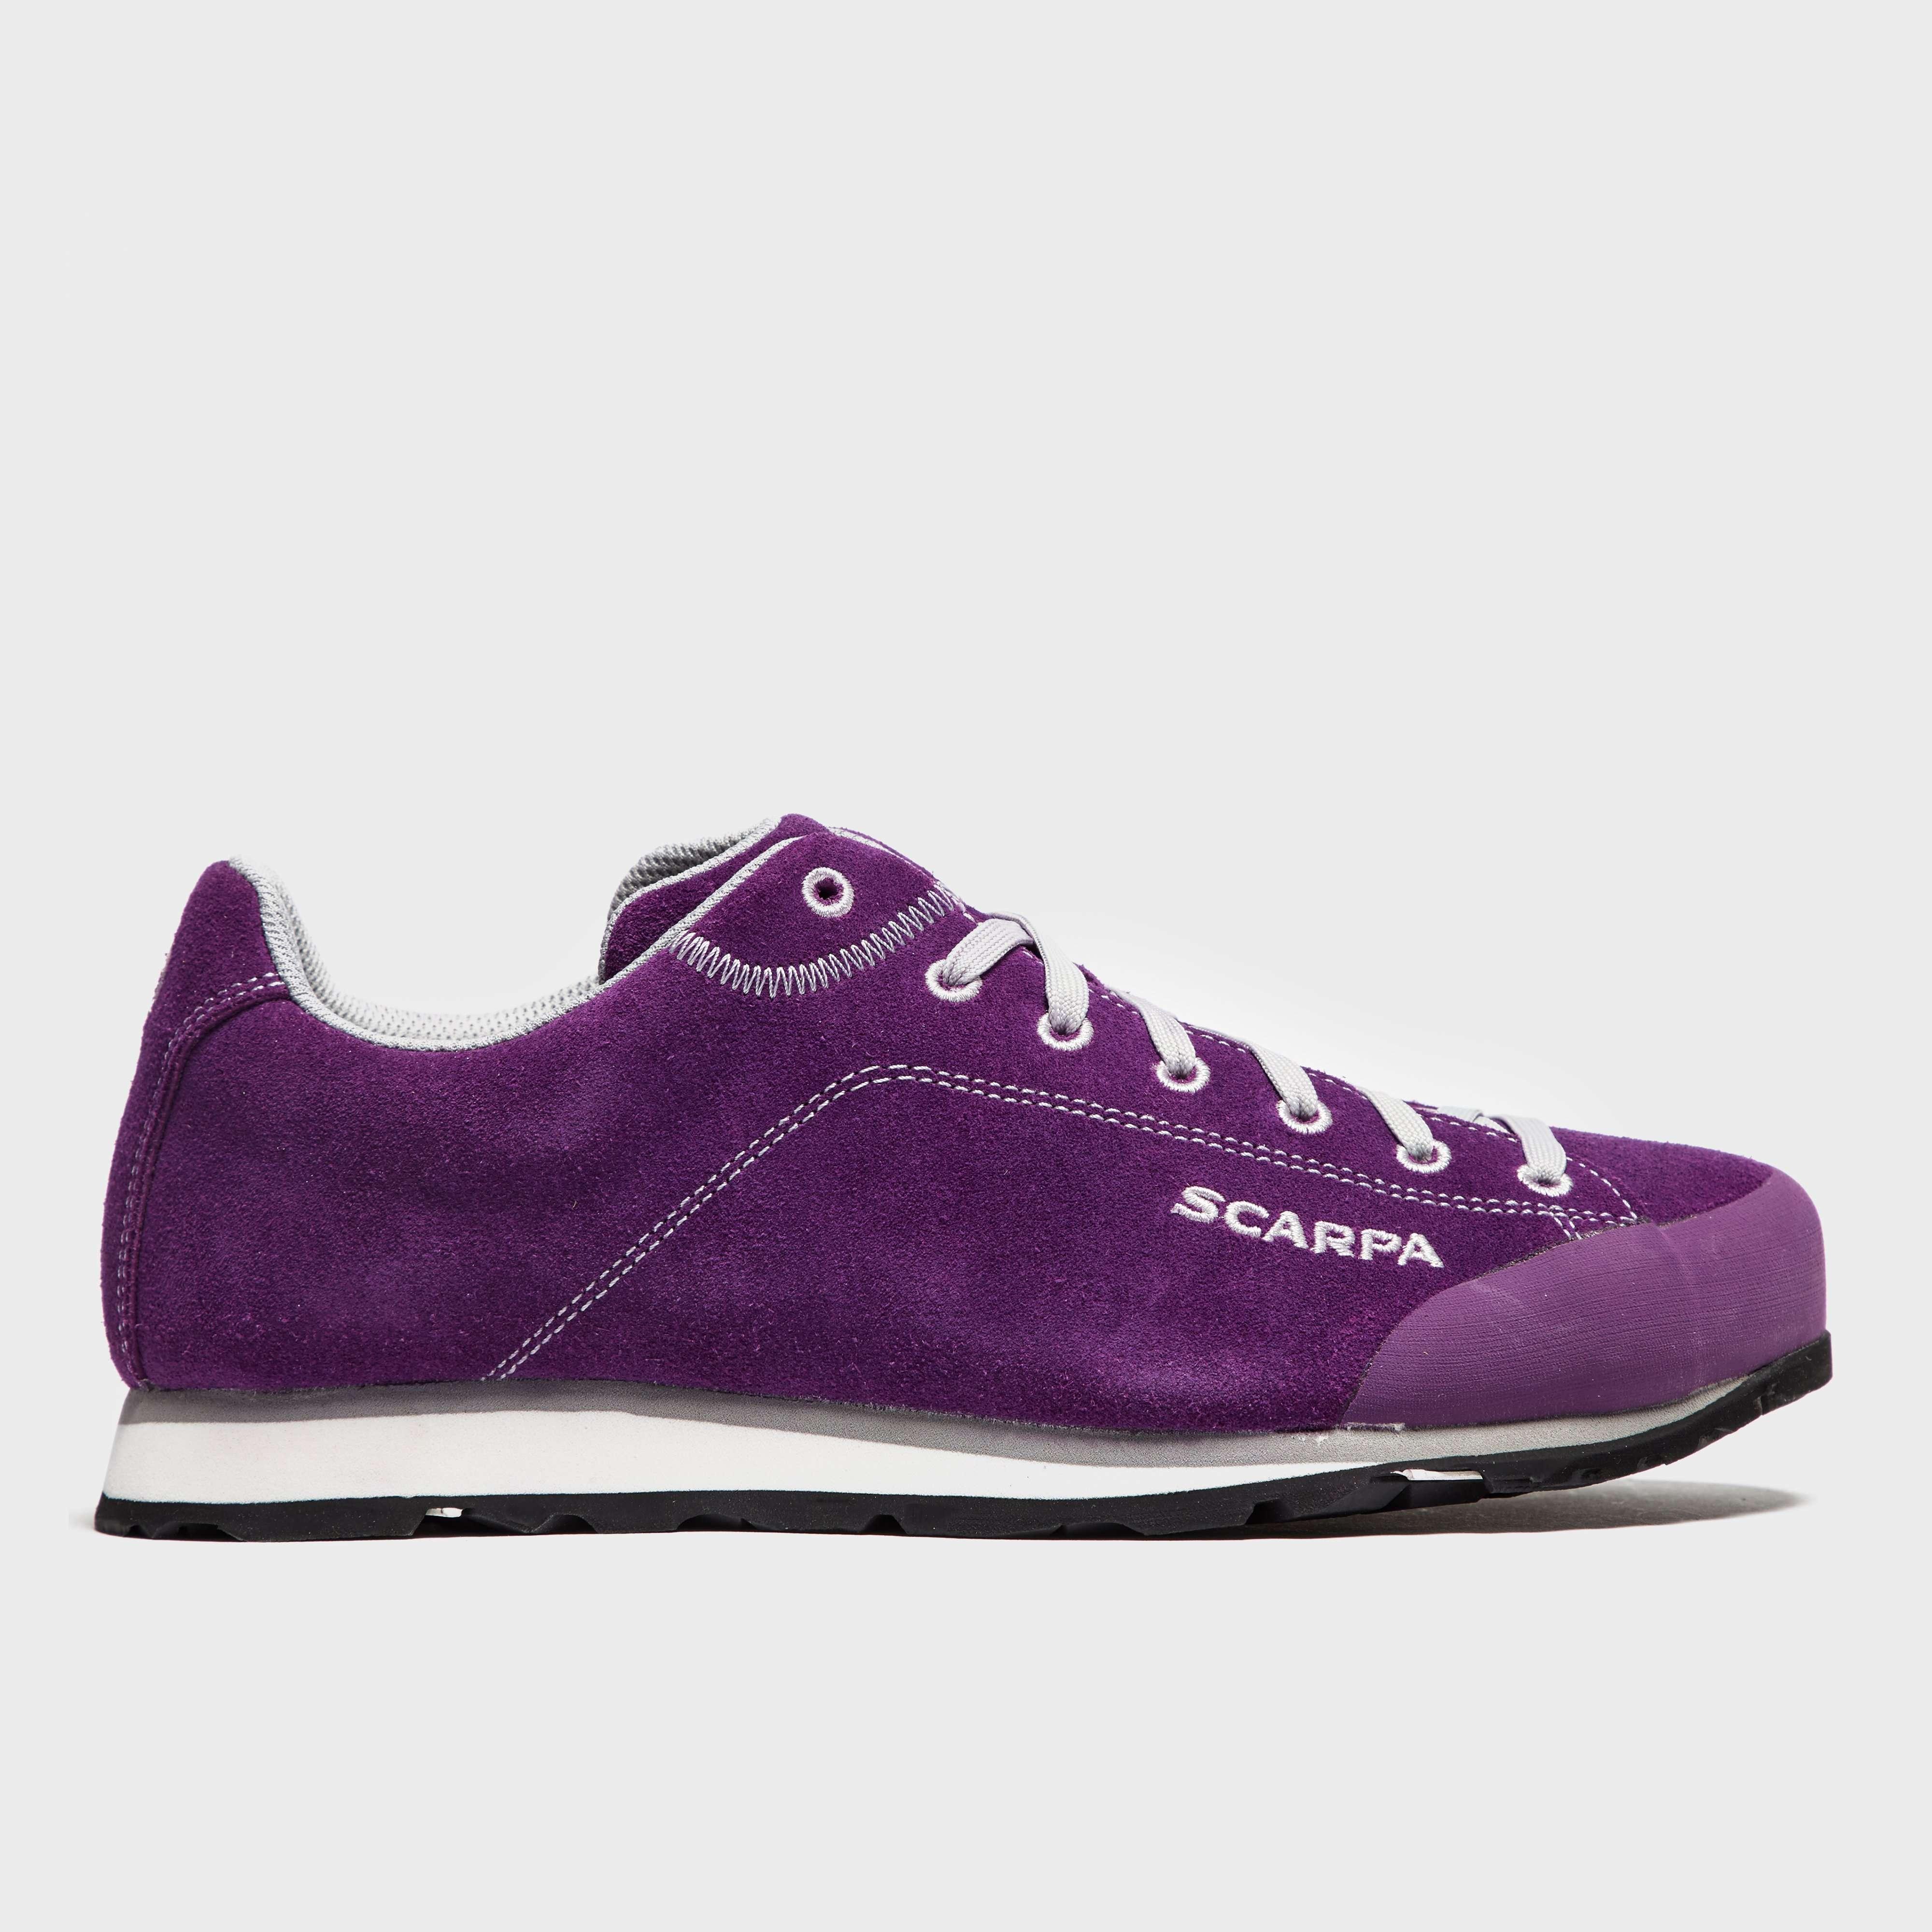 SCARPA Women's Margarita Suede Walking Shoe